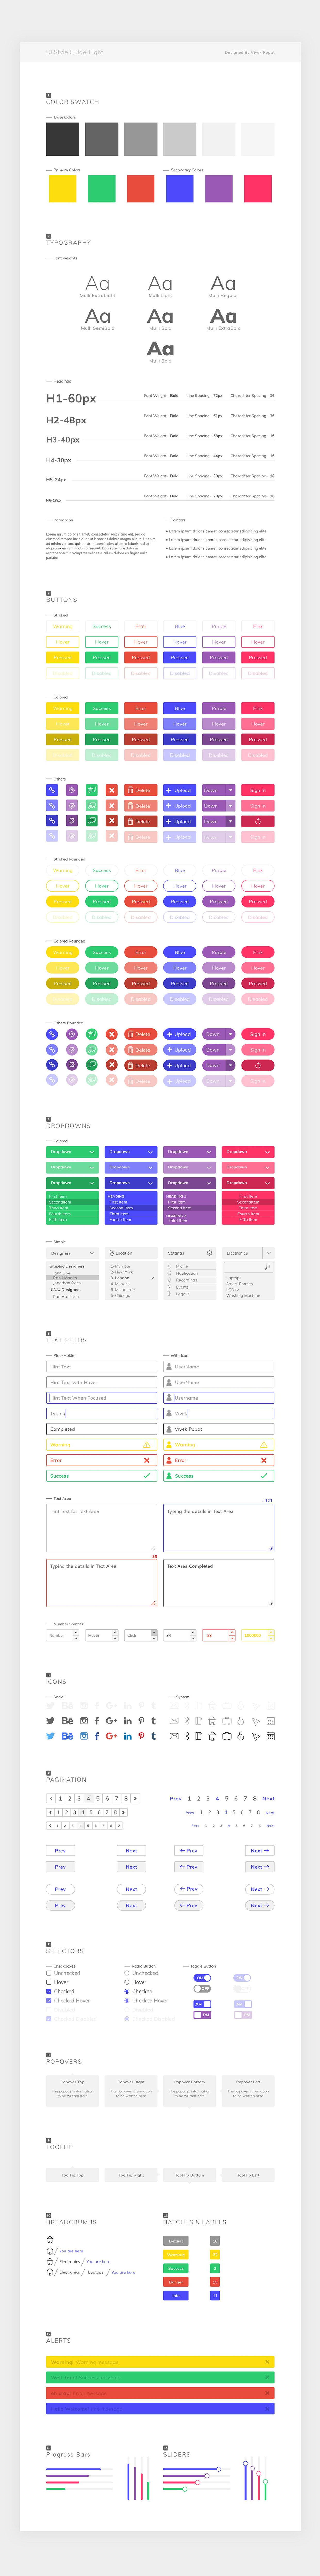 Adobe XD Freebie-UI Style Guide on Behance | Webpage Design | Pinterest